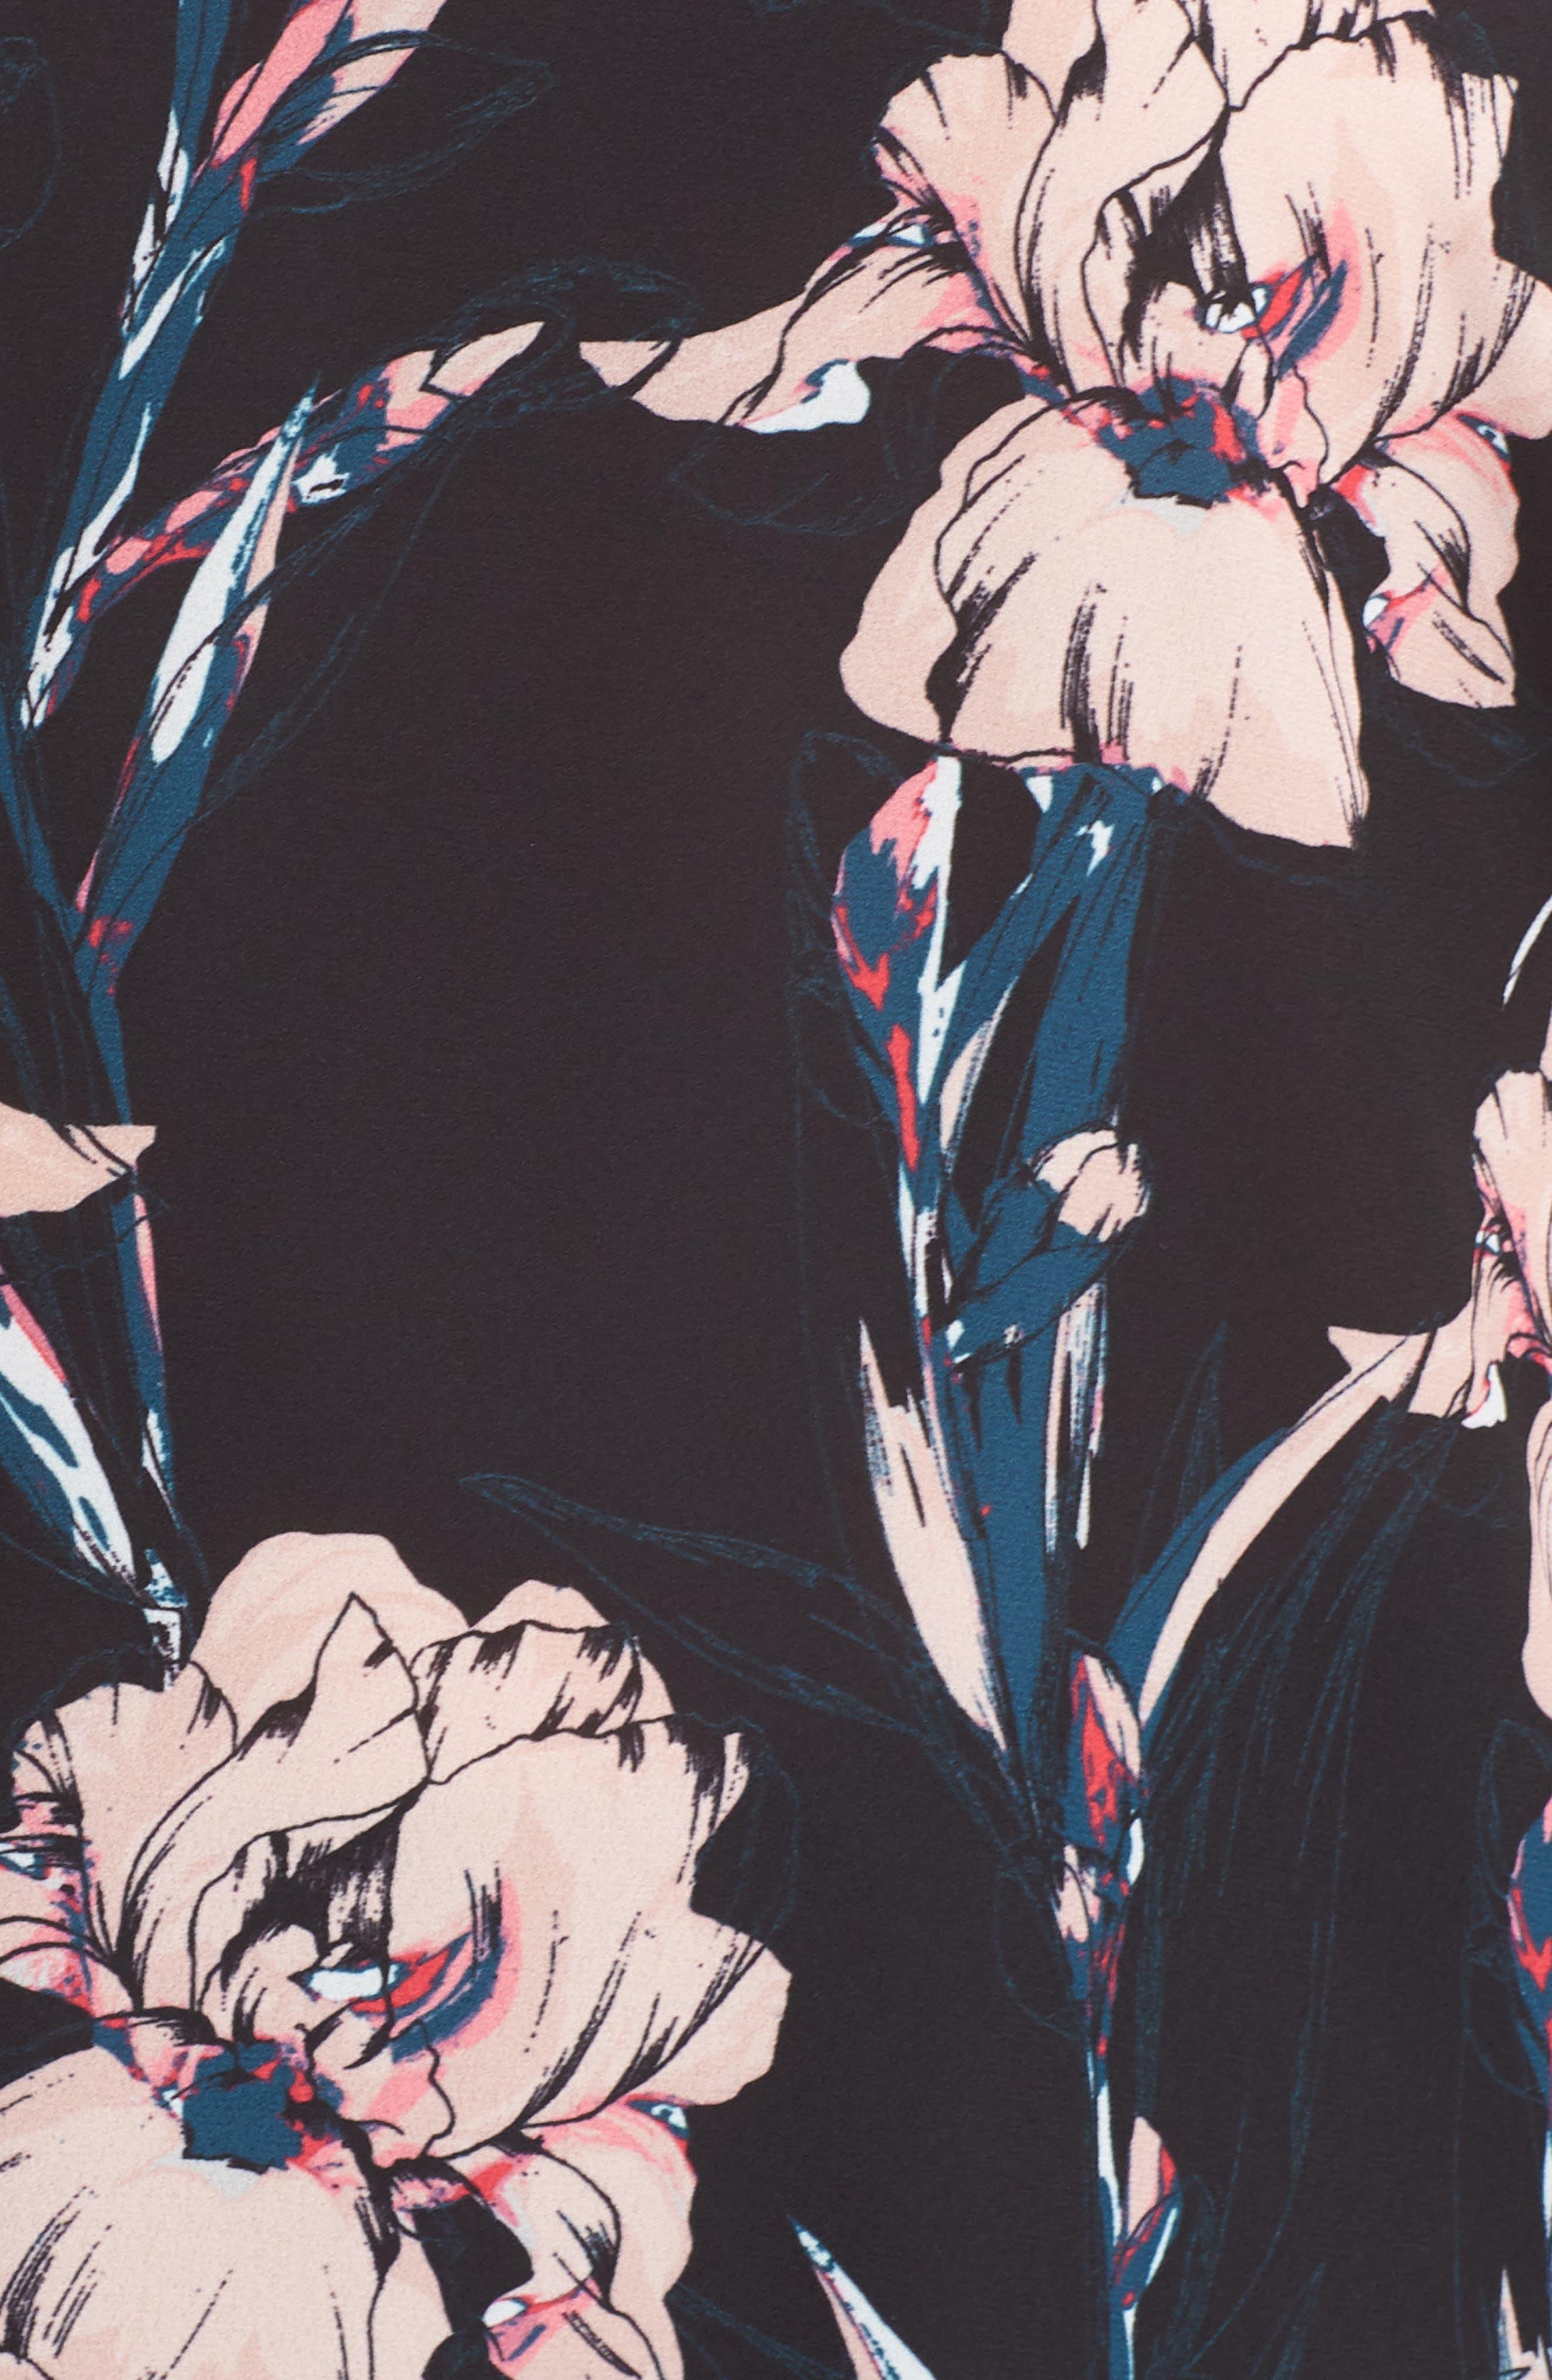 Lace Trim Camisole,                             Alternate thumbnail 5, color,                             BLACK INKED IRIS